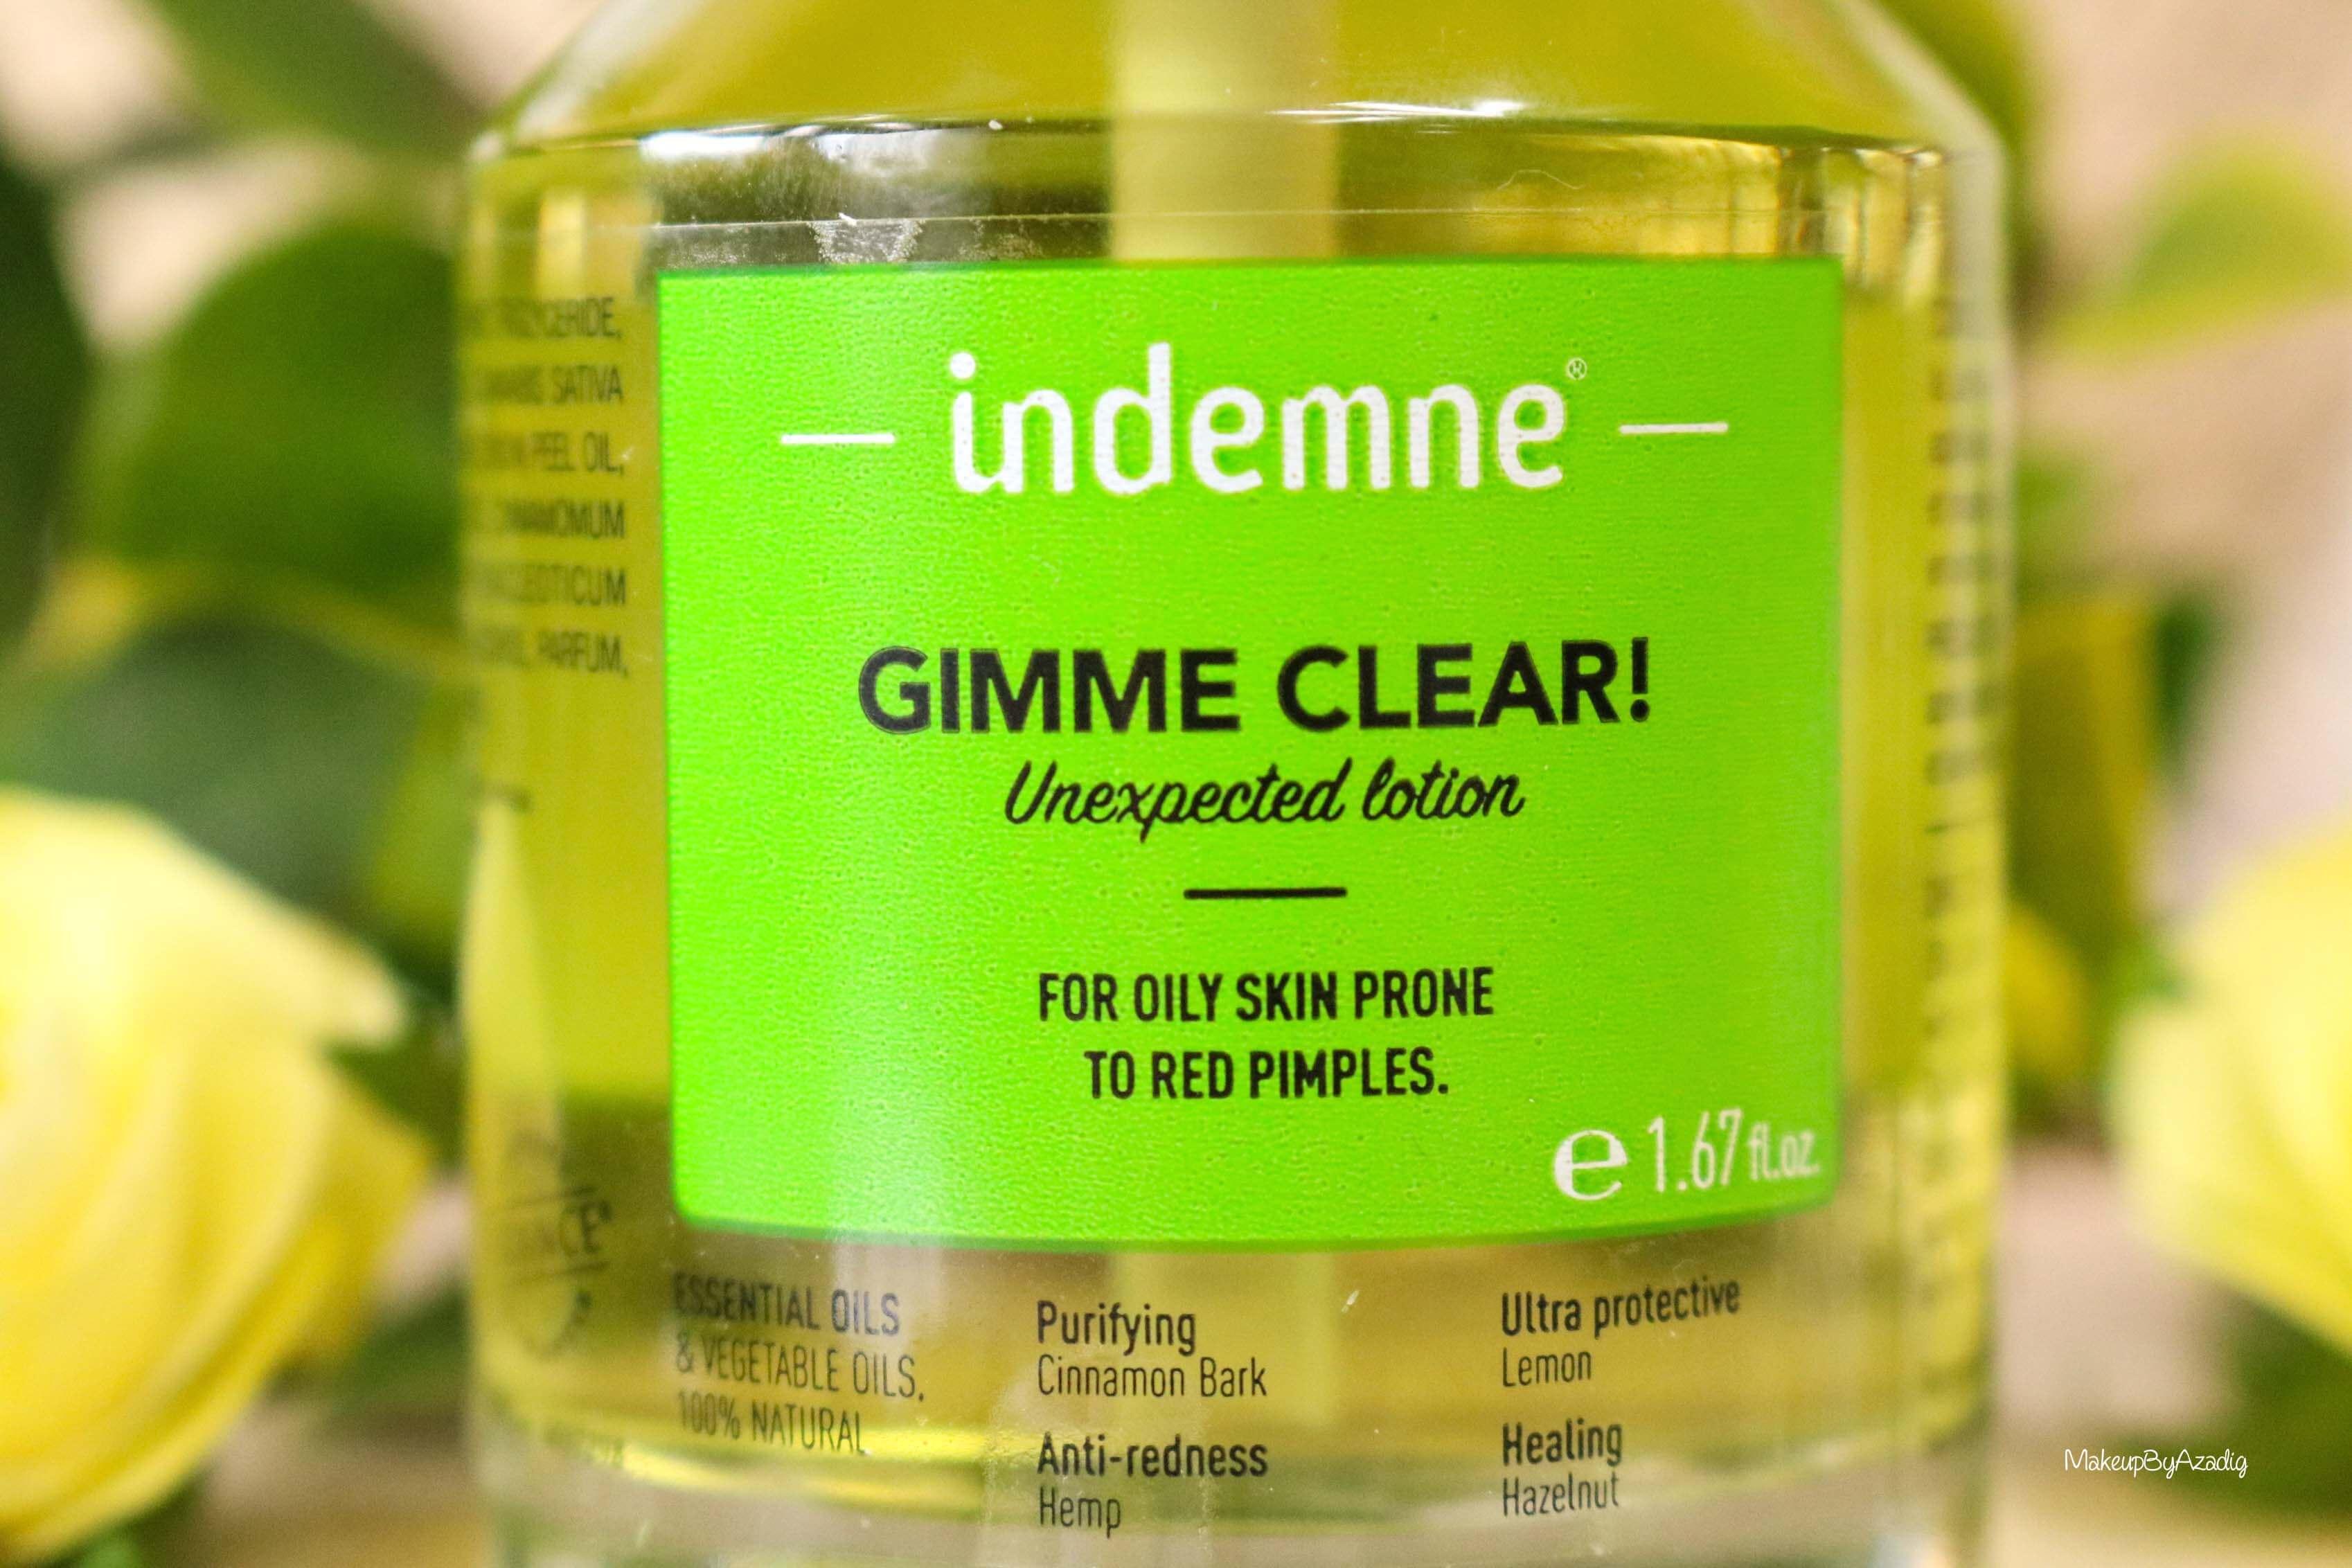 revue-deboutonnez-moi-indemne-produit-acnee-bio-huiles-parapharmacie-prix-avis-makeupbyazadig-gimme-clear